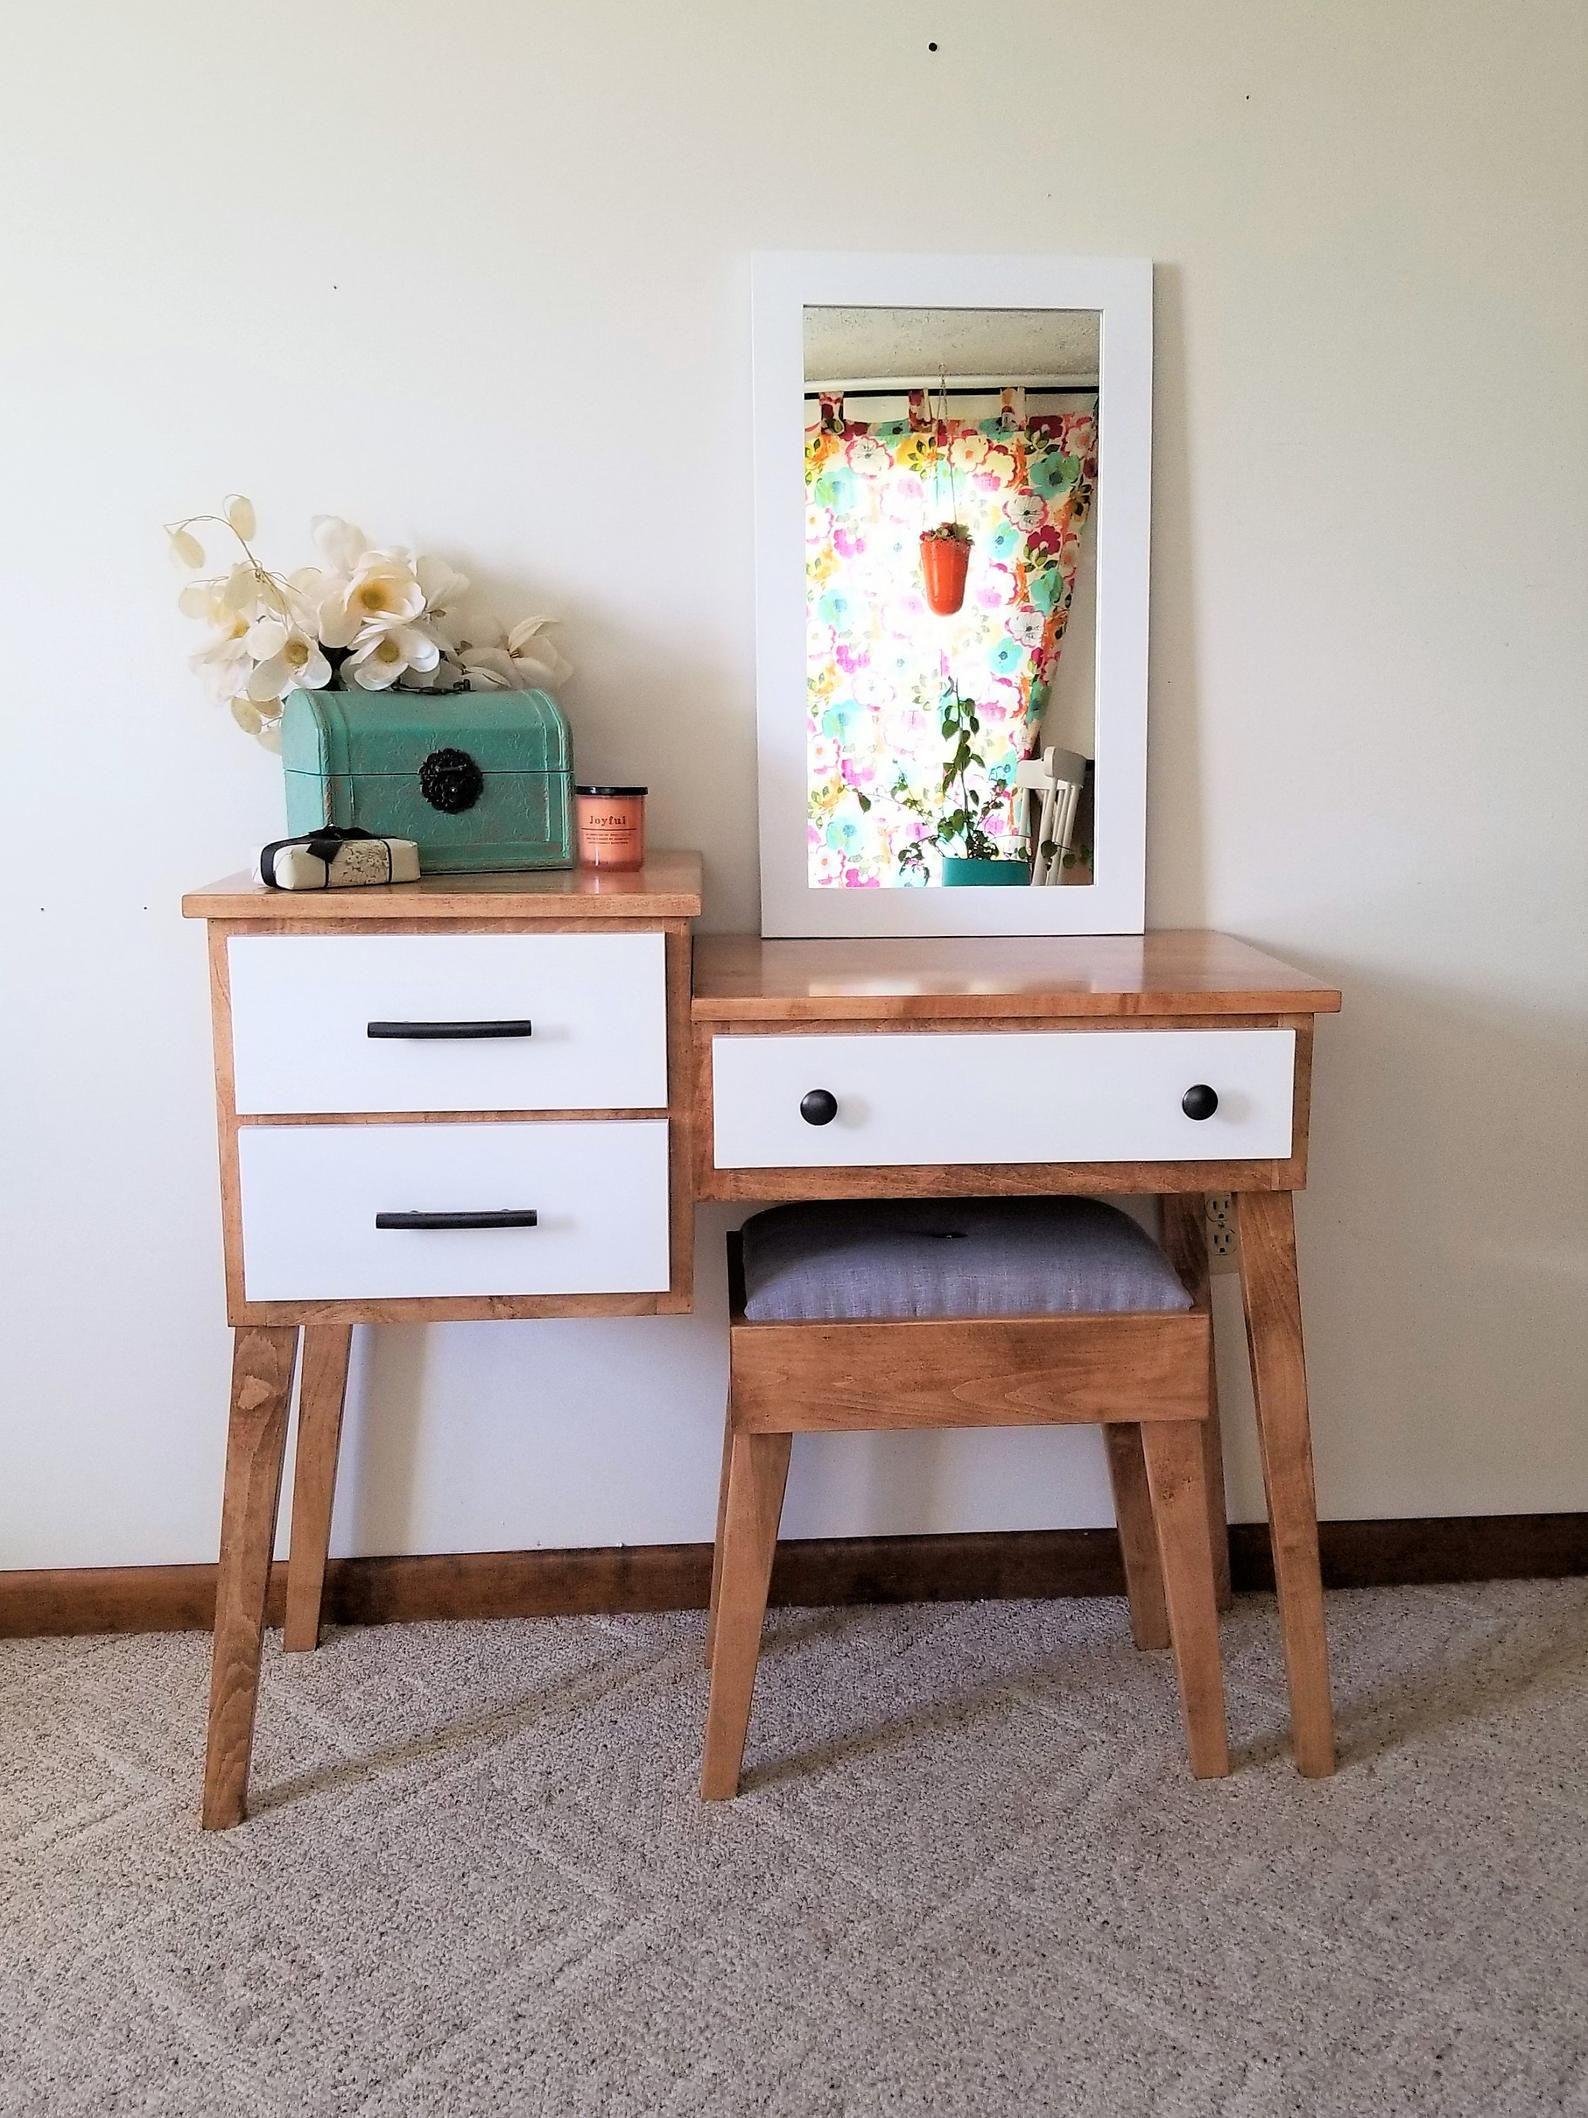 Mid Century Modern Makeup And Vanity Table By Meagans Mood Etsy Mid Century Modern Vanity Modern Vanity Table Minimalist Bedroom Design